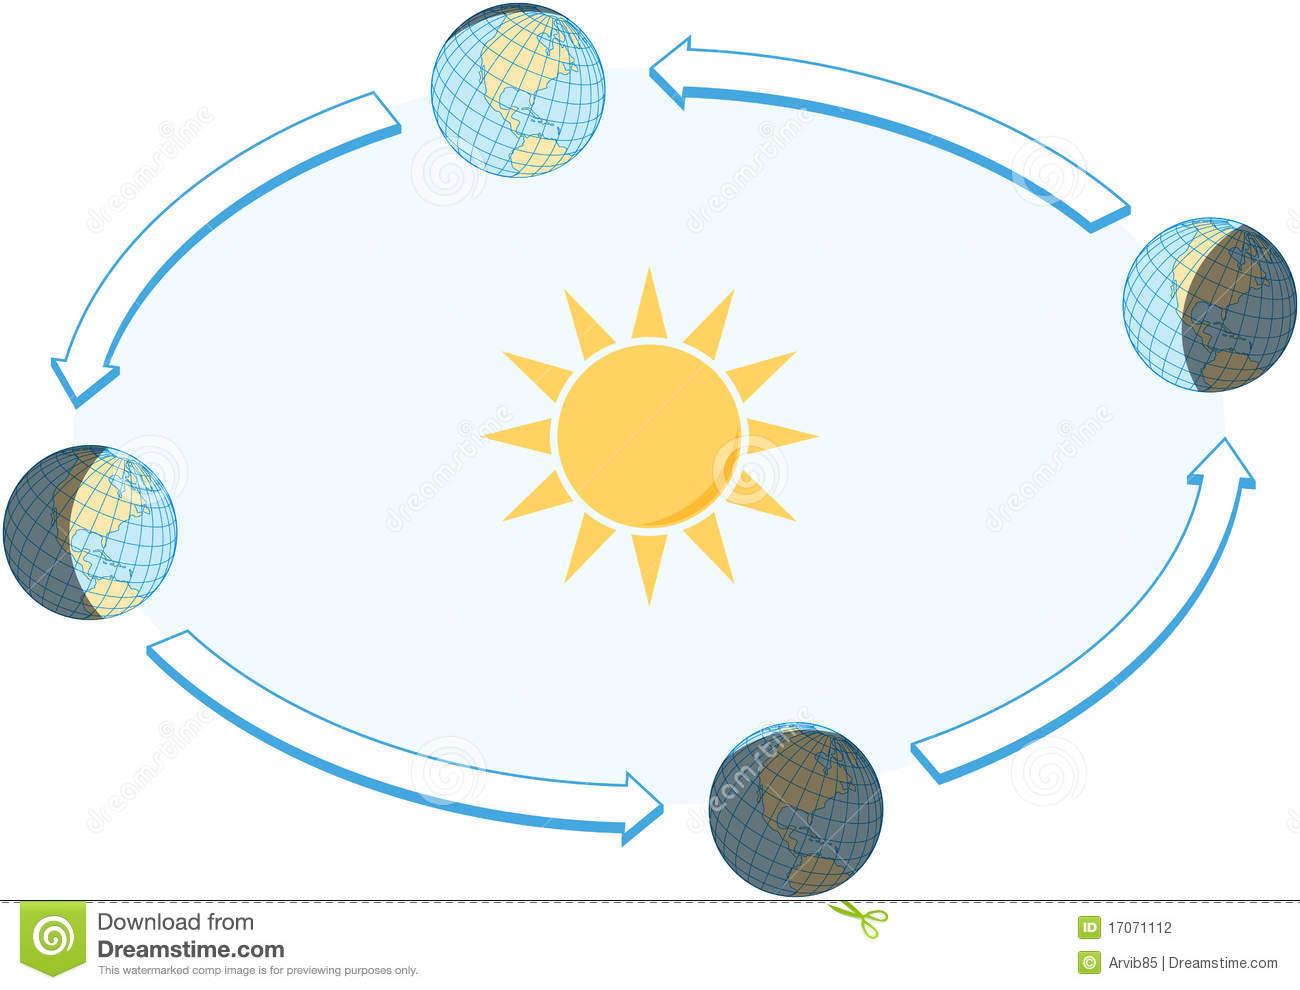 Equinox And Solstice-Equinox and Solstice-7